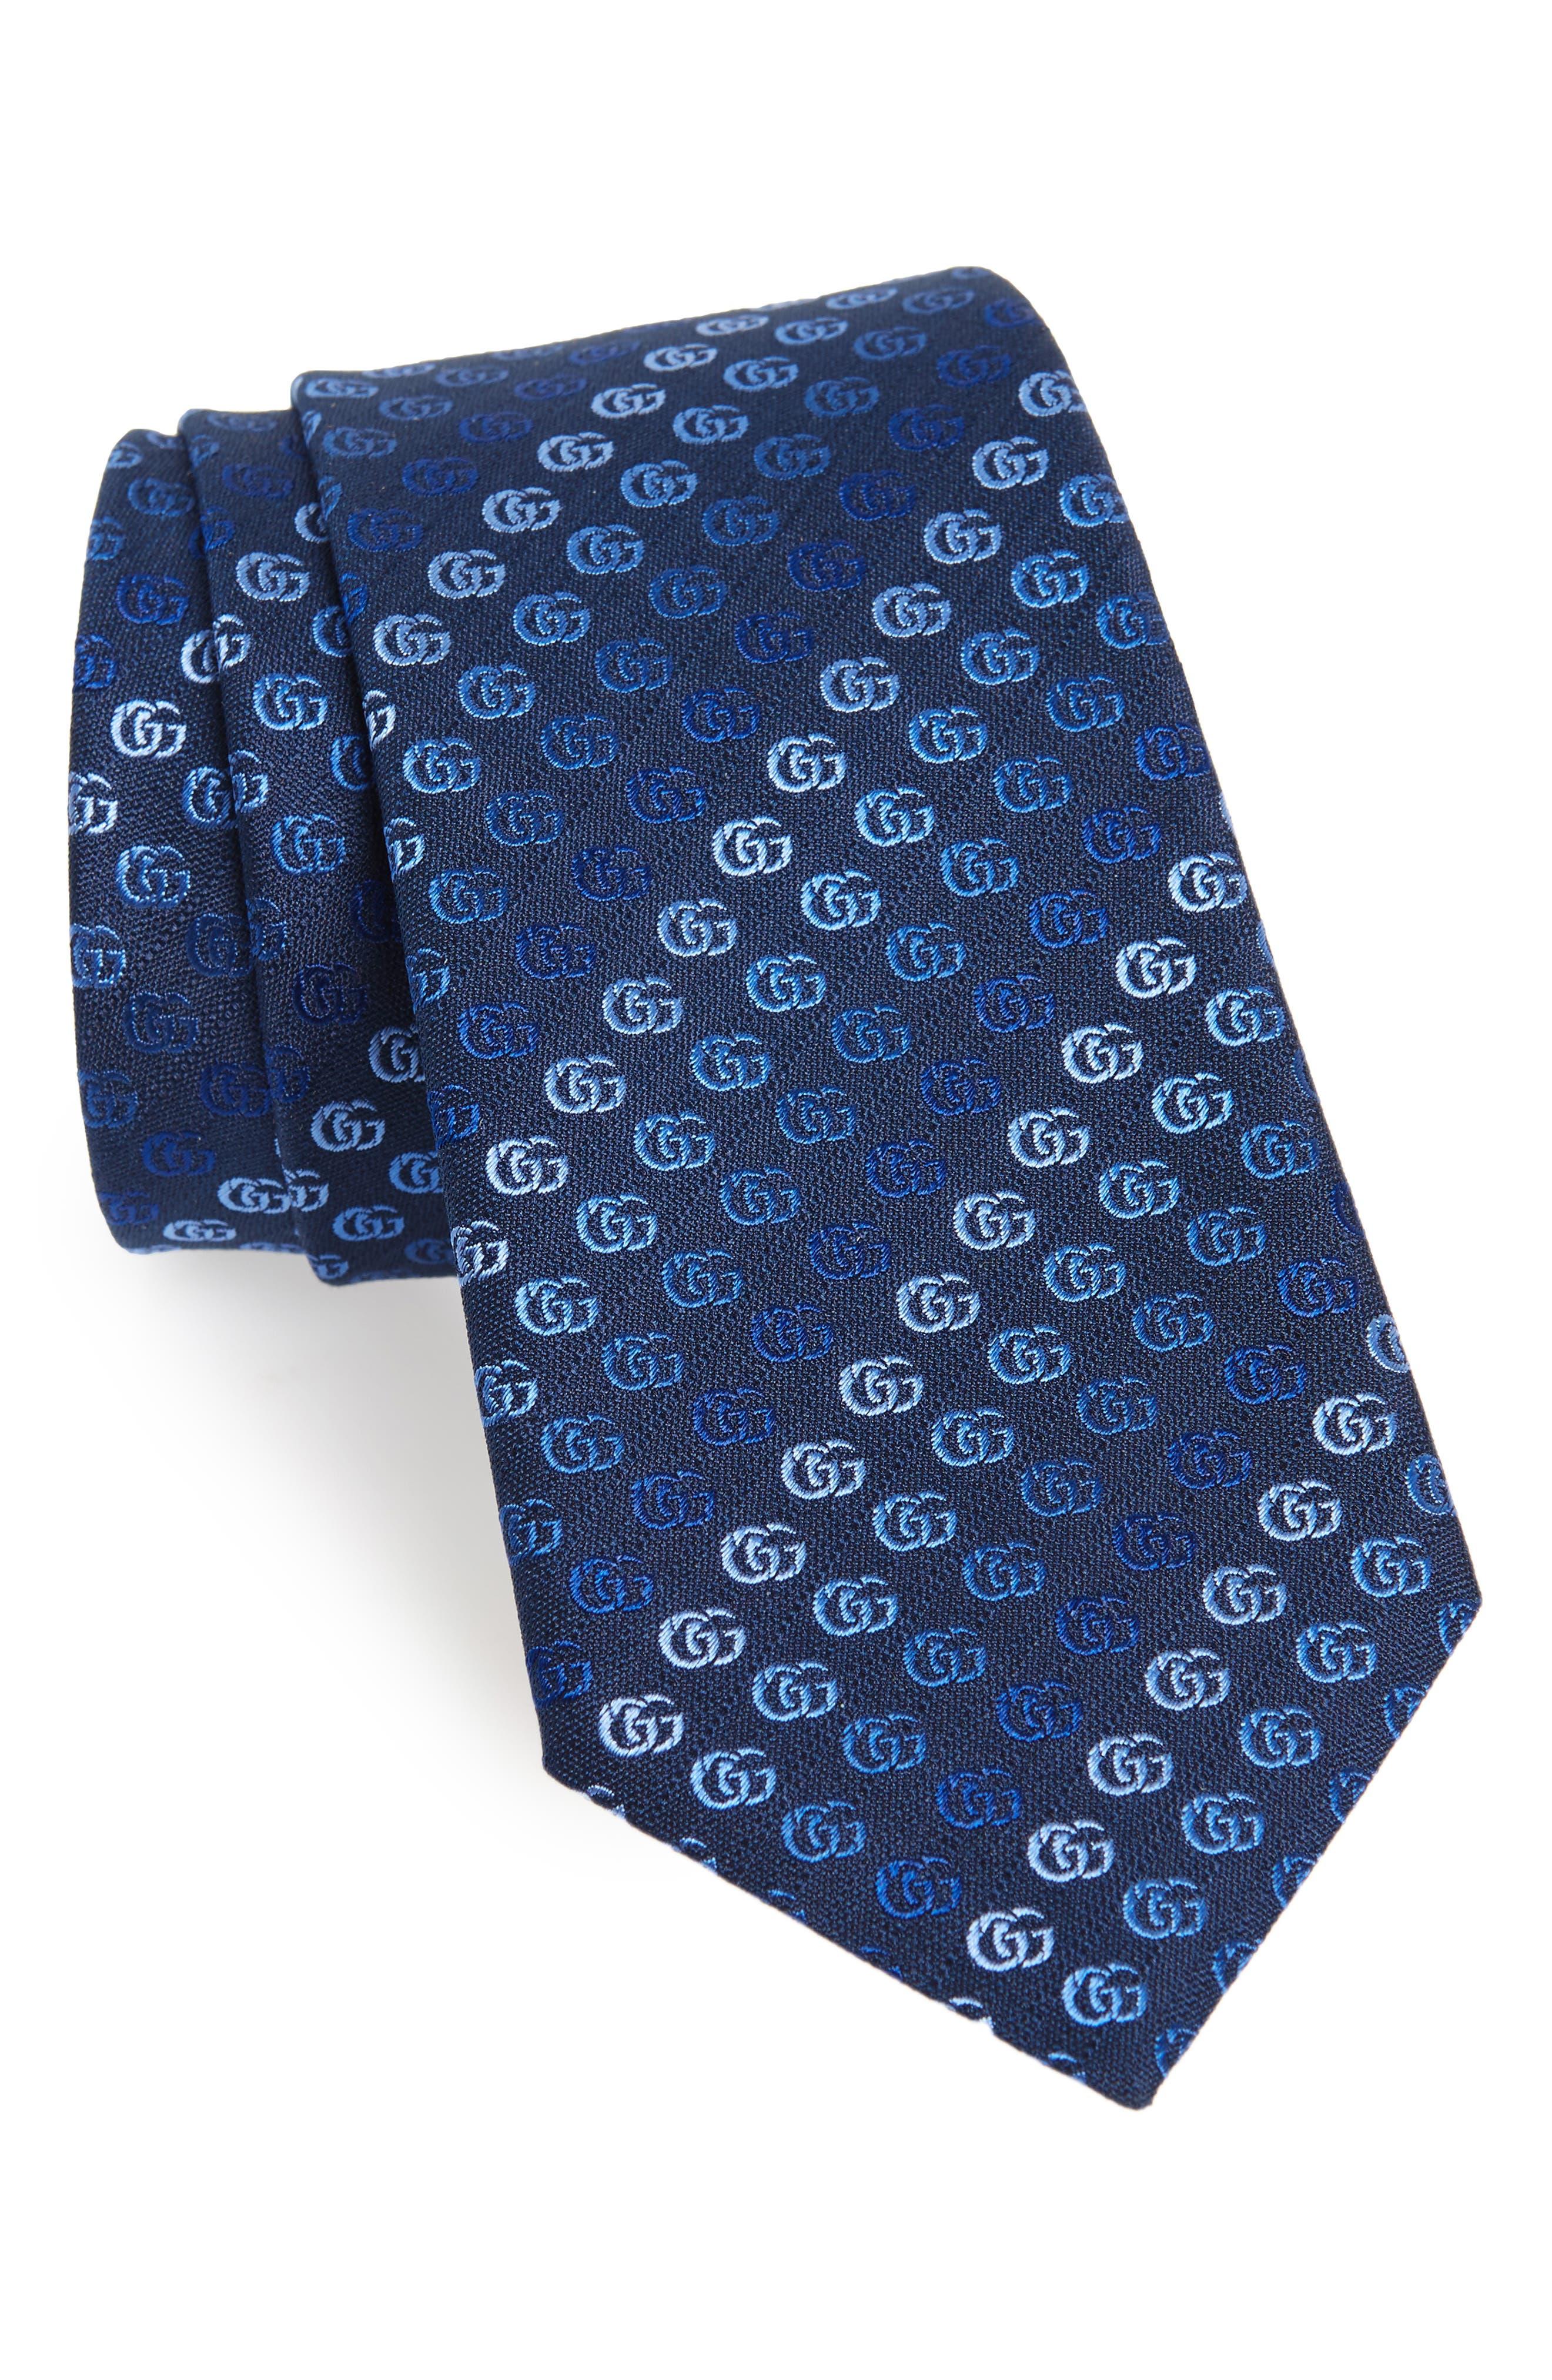 Soft Running GG Silk Tie,                         Main,                         color, 452